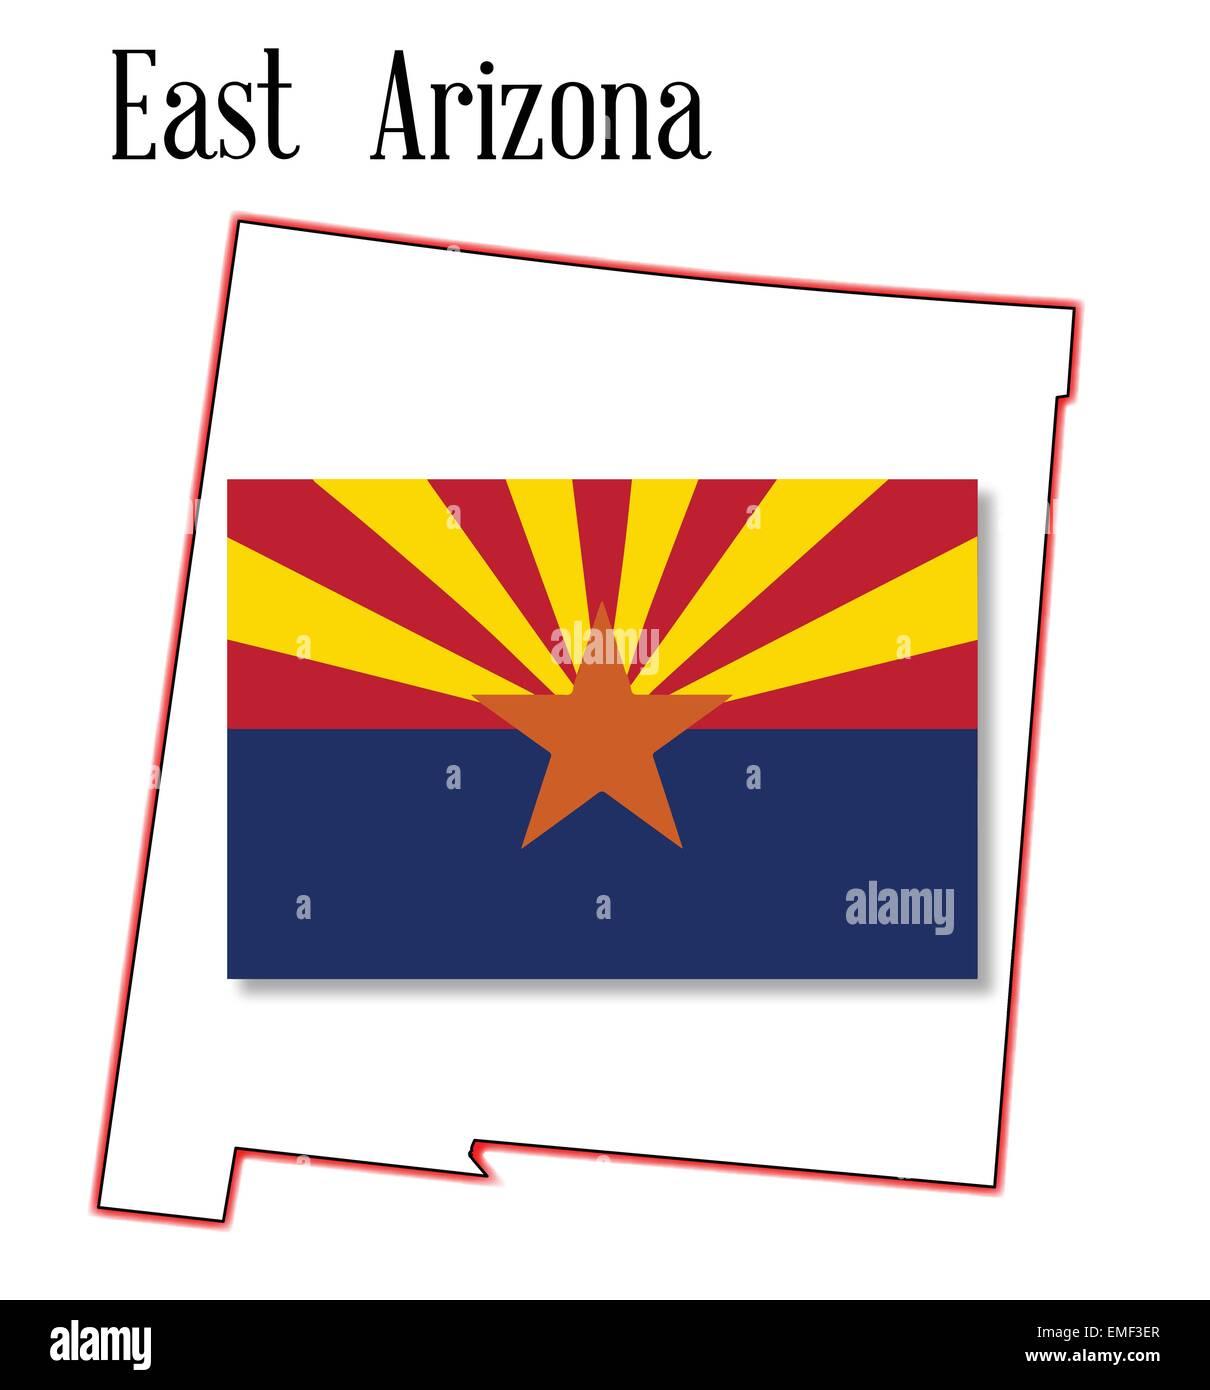 Map Of East Arizona.East Arizona Map And Flag Stock Vector Art Illustration Vector